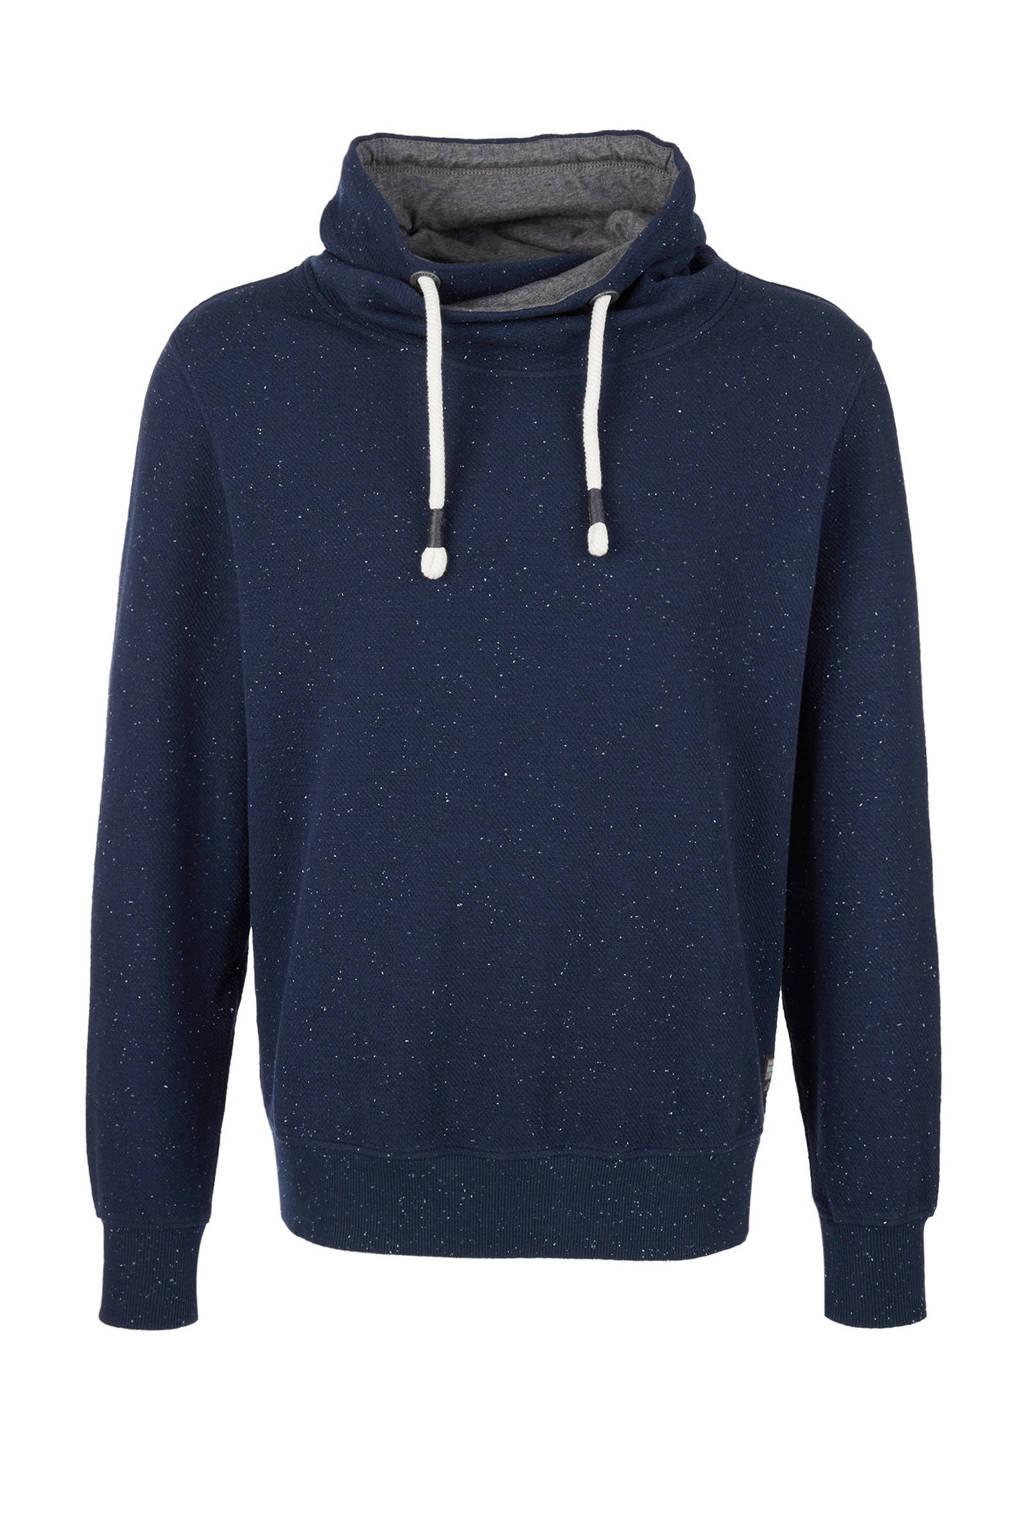 s.Oliver gestipte sweater donkerblauw, Donkerblauw